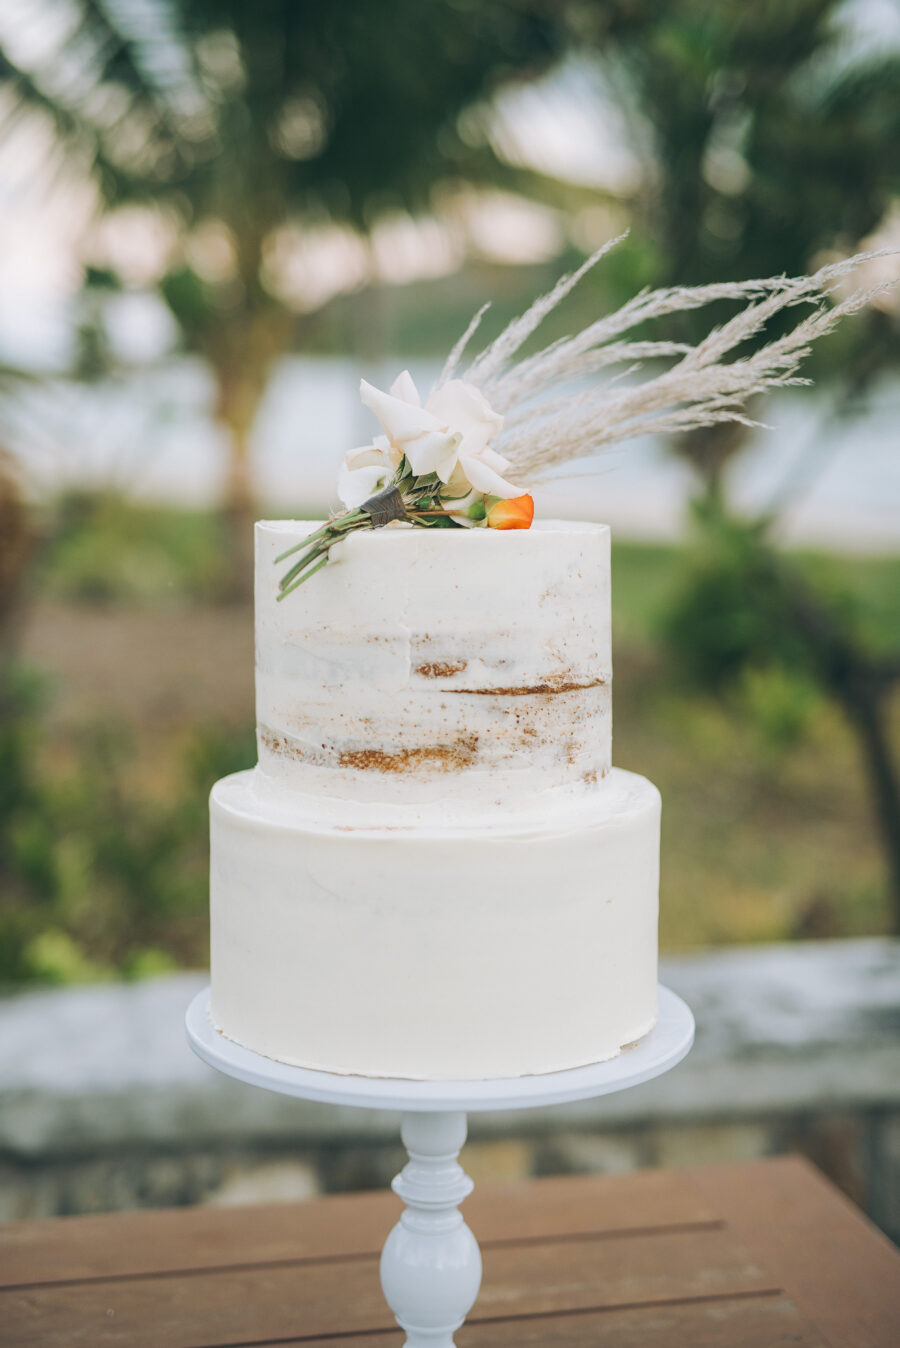 Caribbean wedding cake design: Intimate Caribbean Wedding by Details Nashville